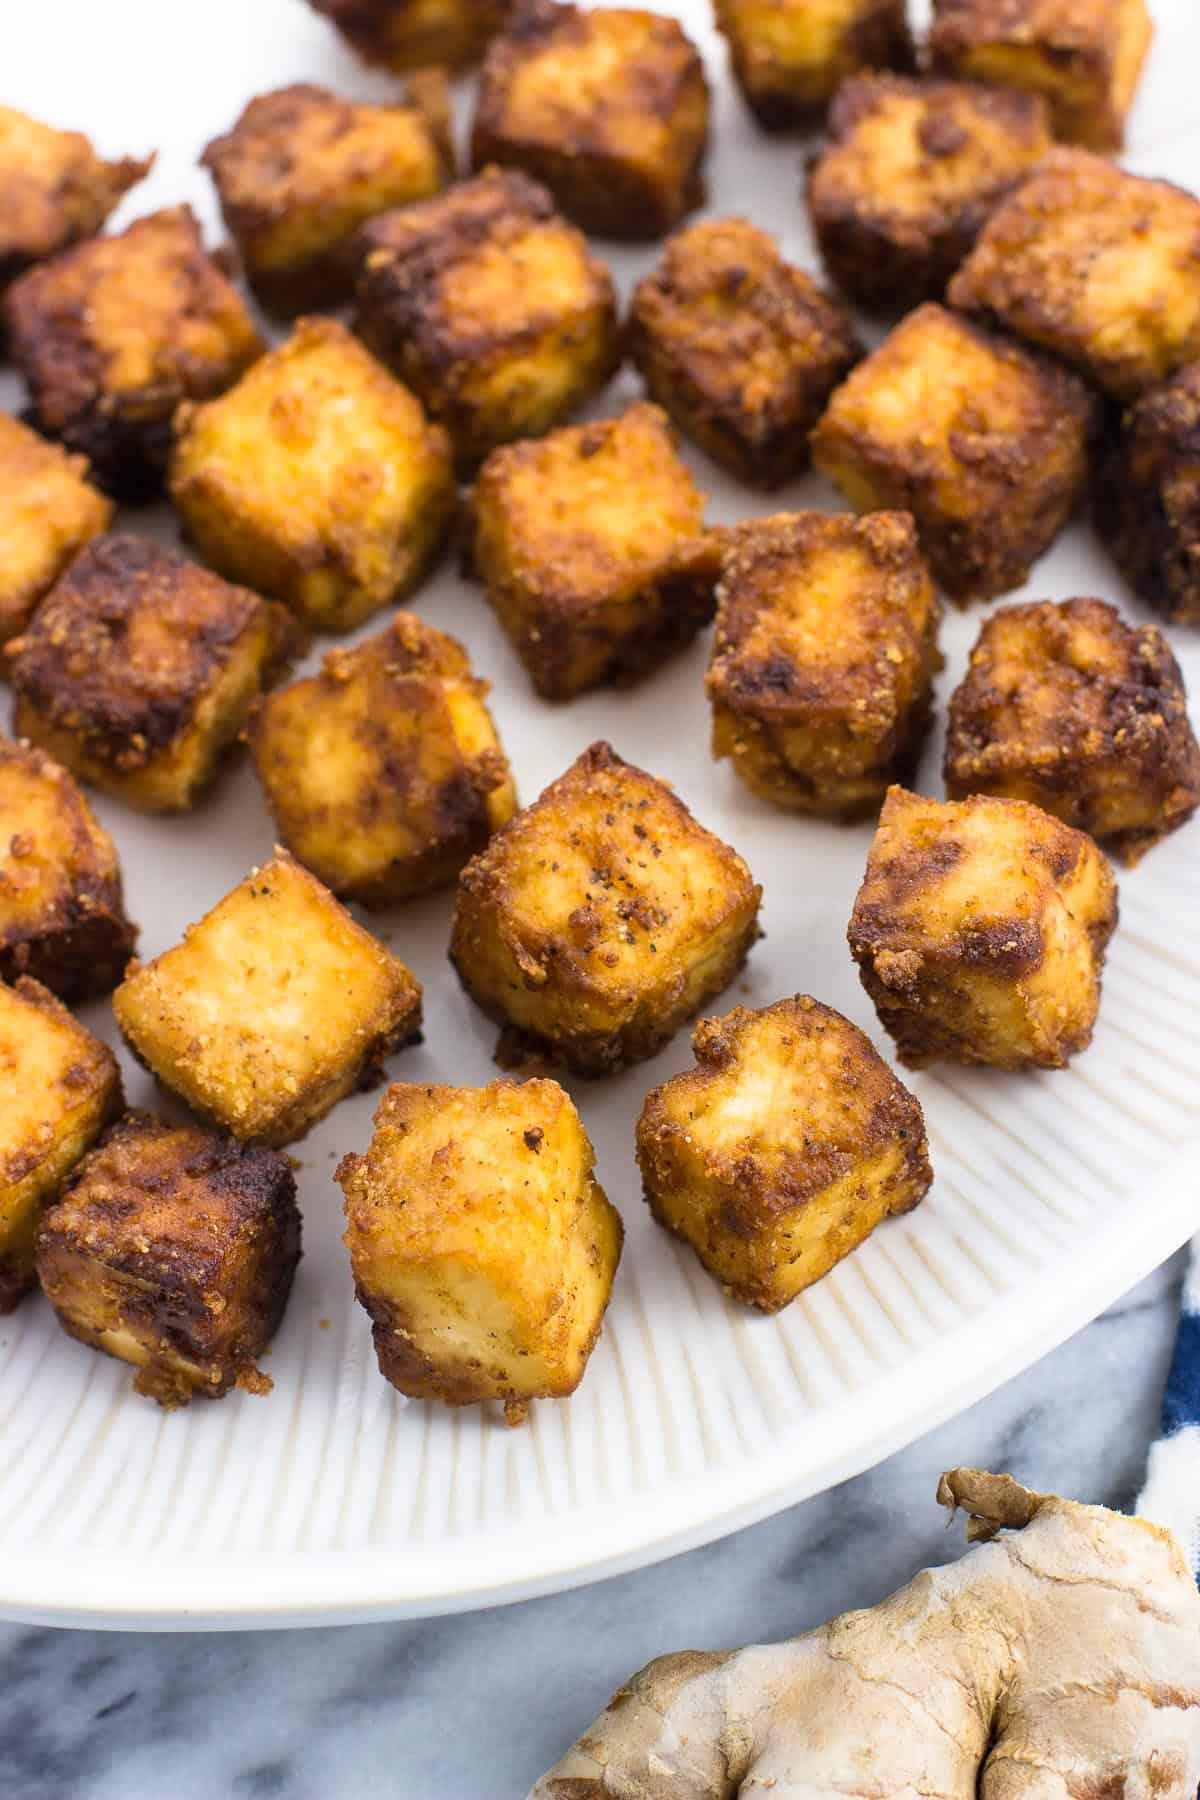 Crisp bite-sized blocks of tofu on a  plate.